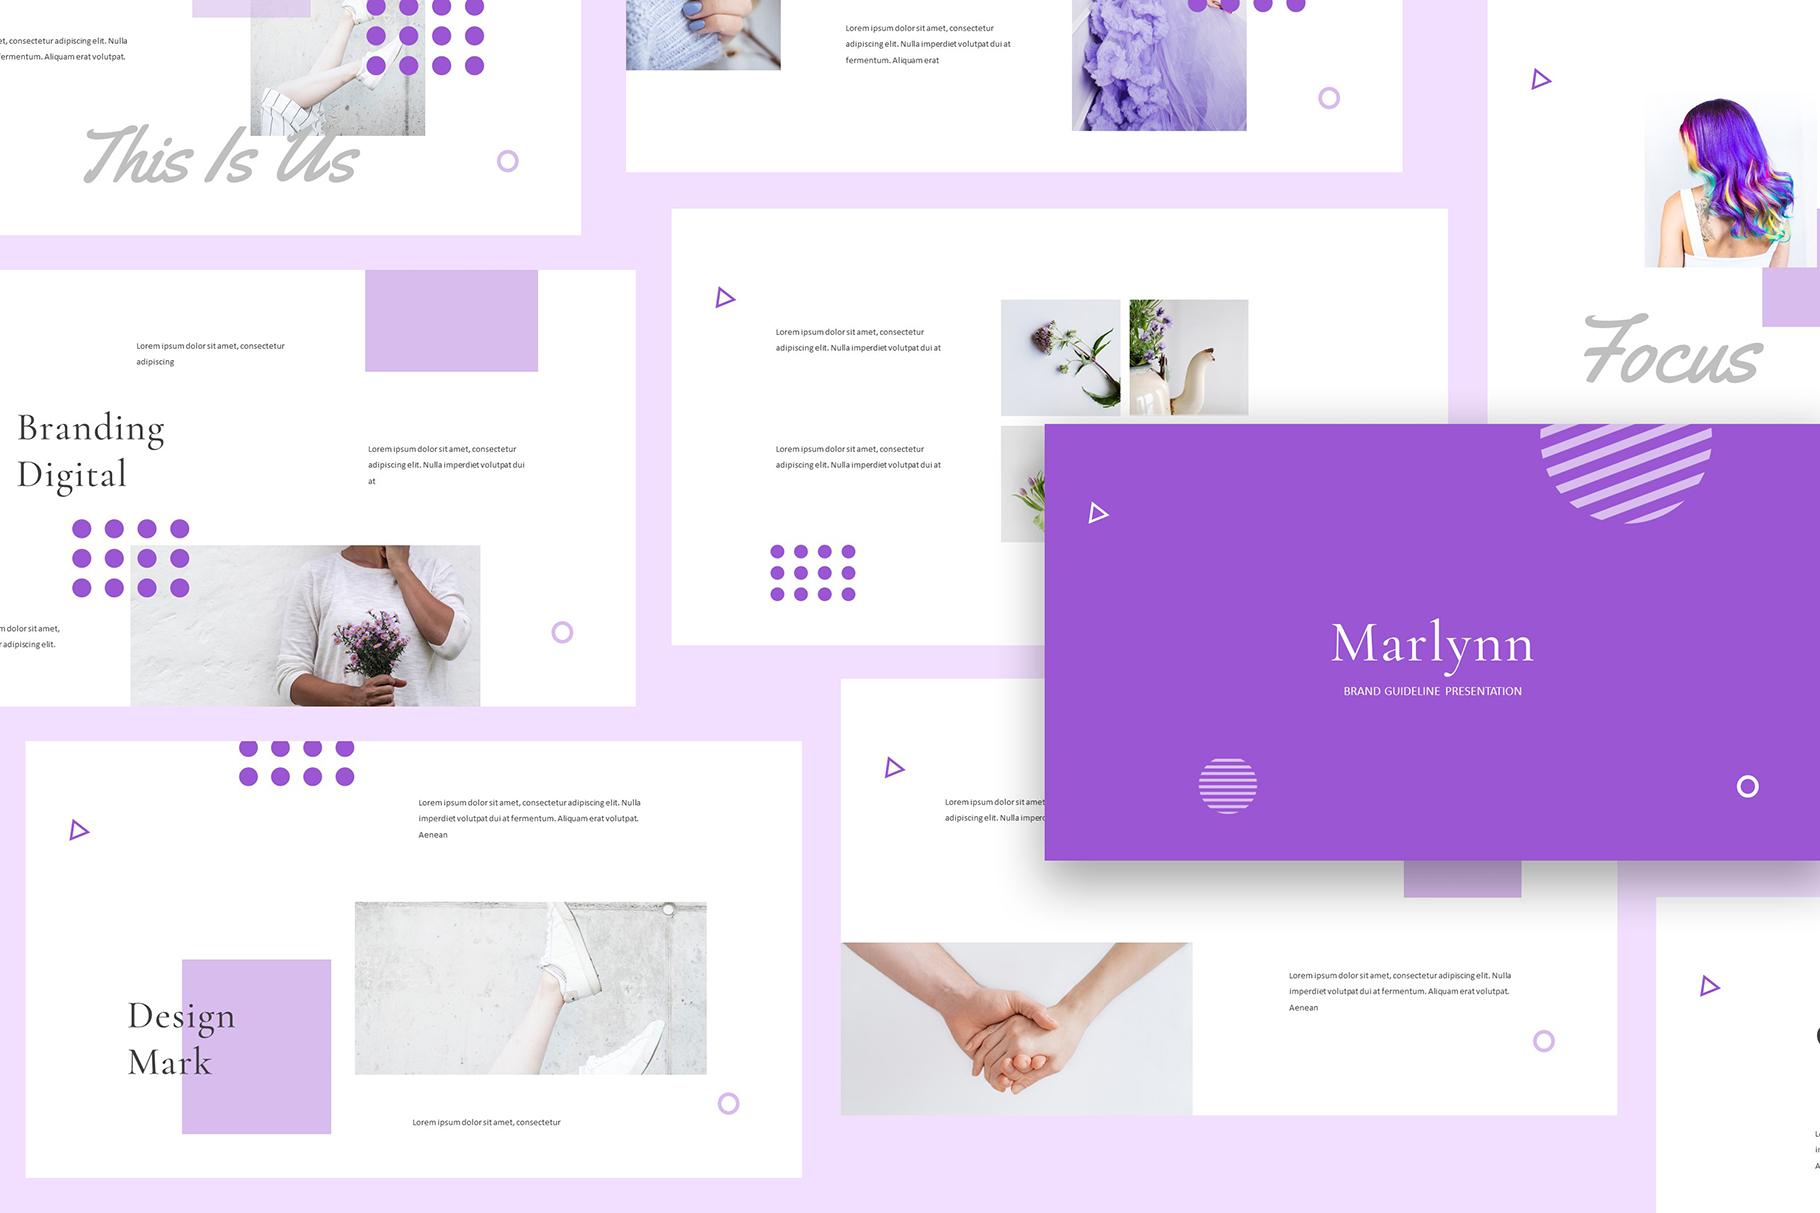 Marlynn Brand Guidelines Keynote example image 3